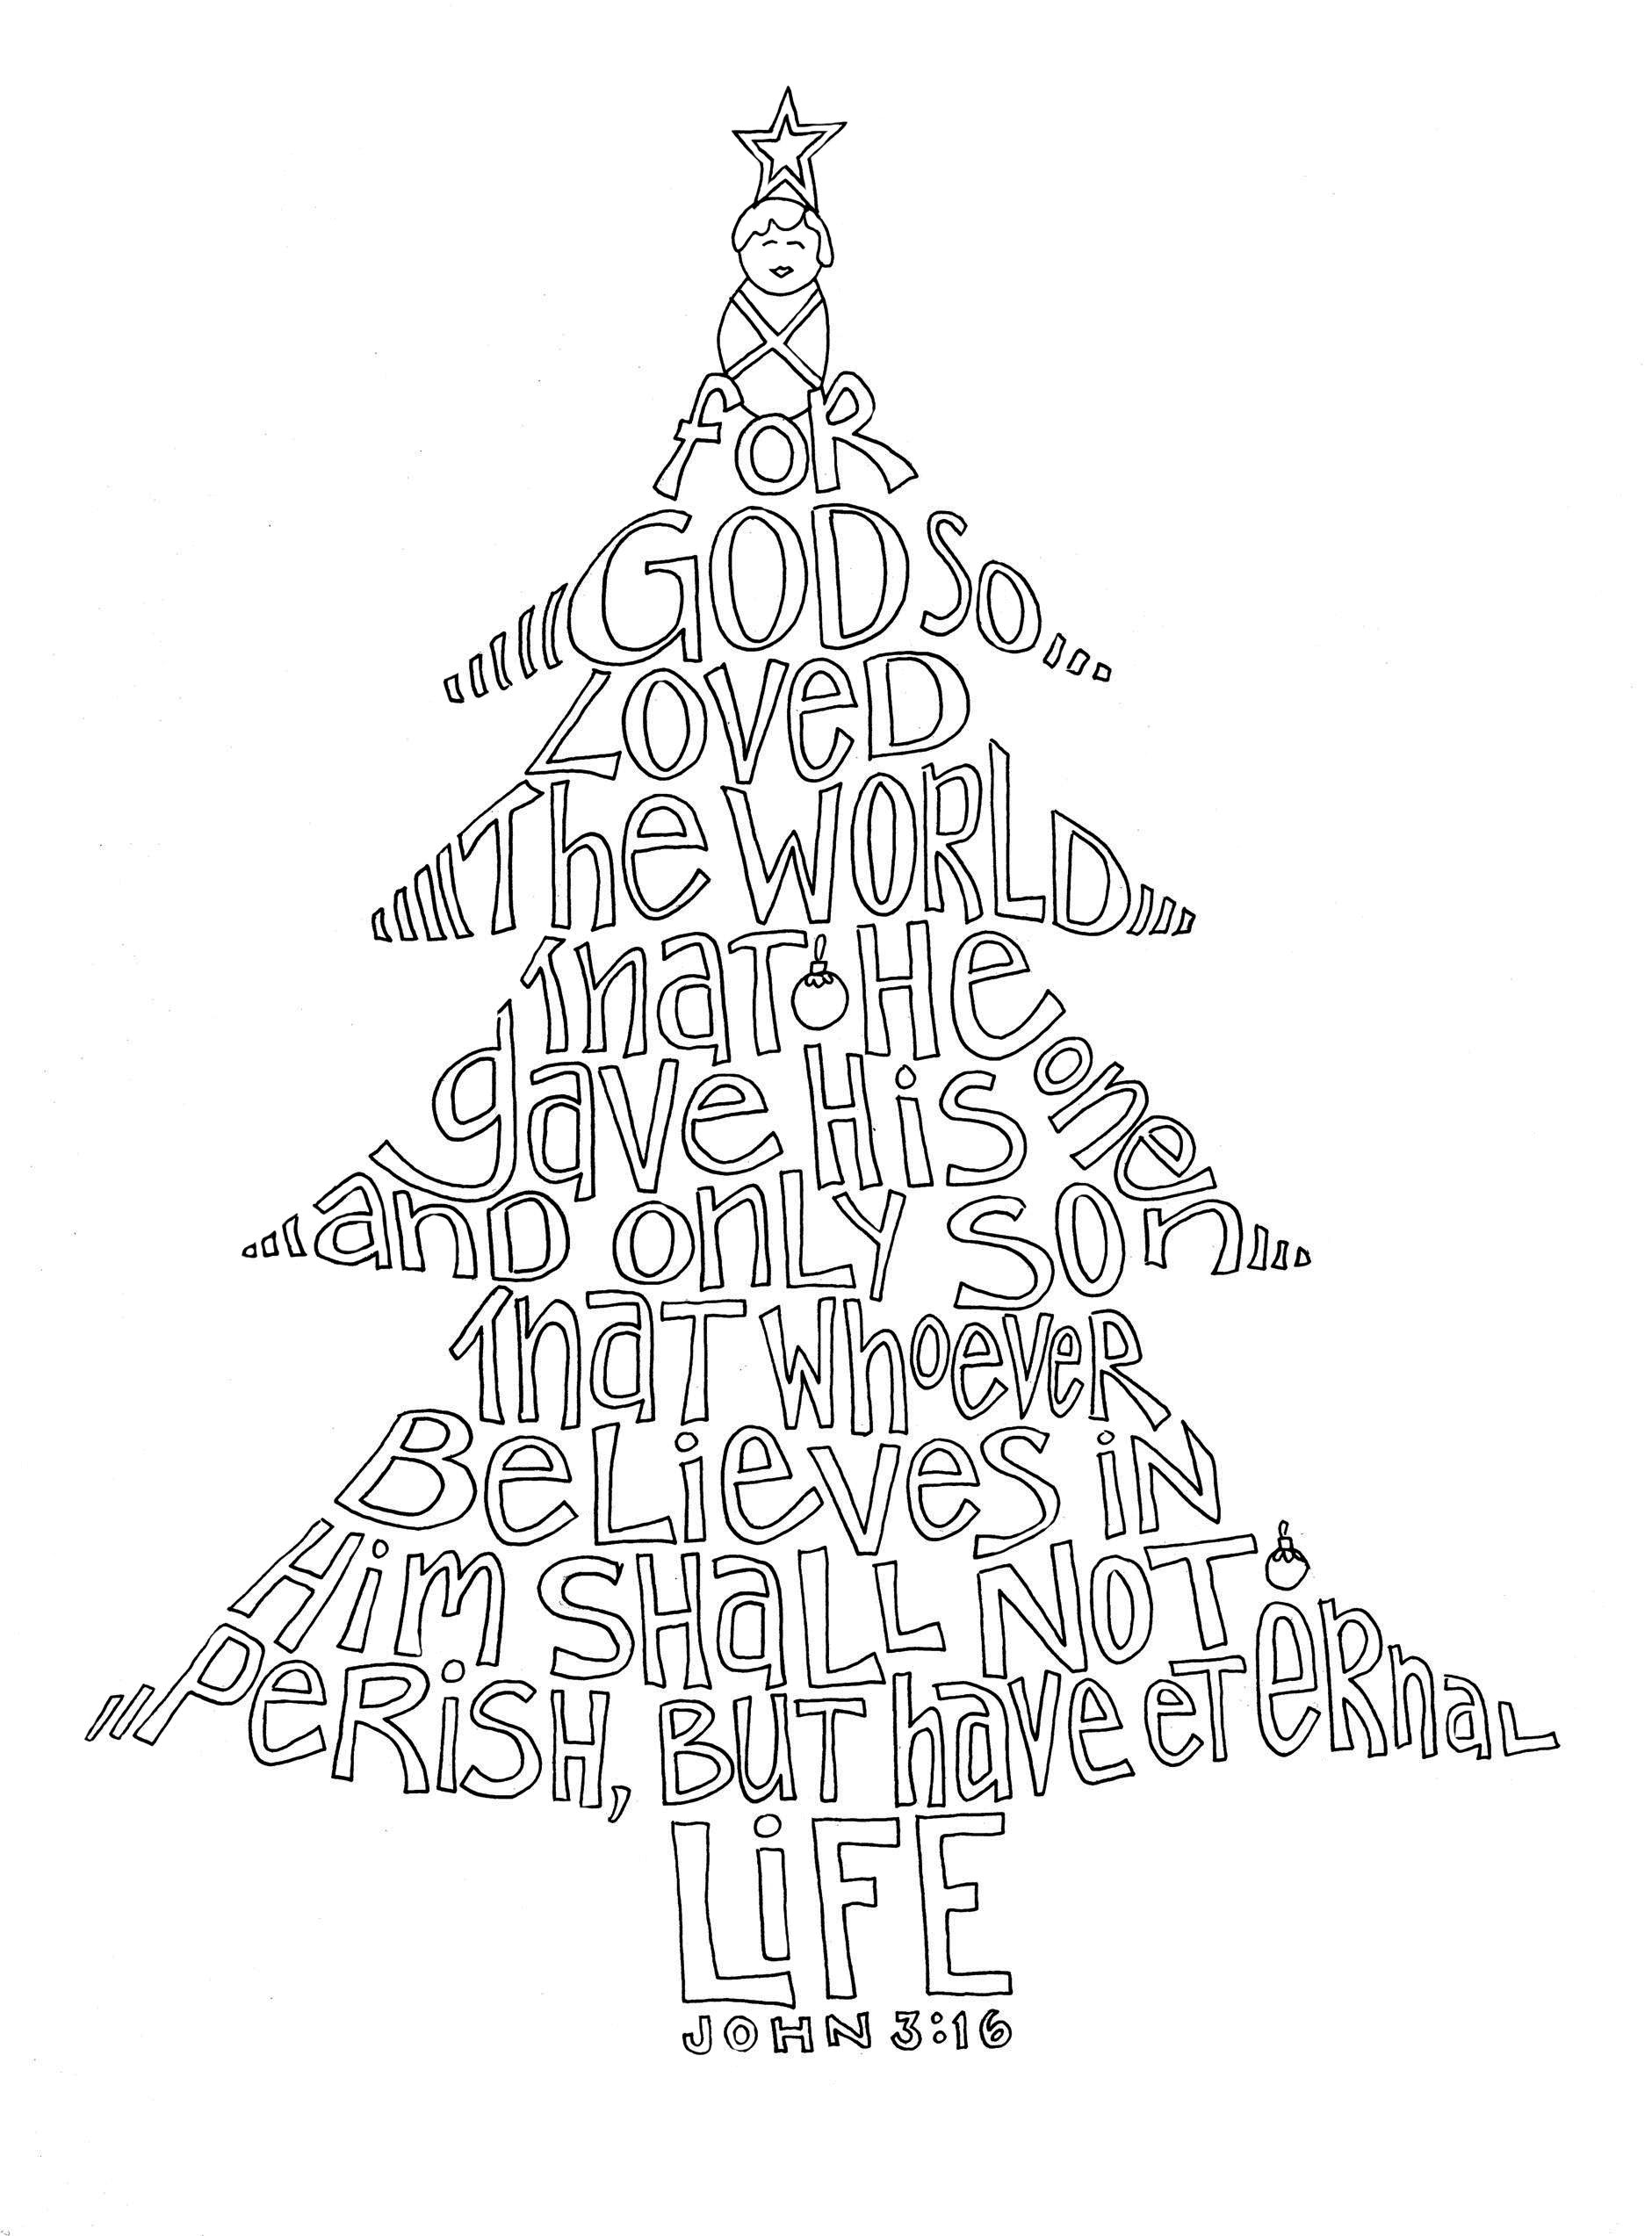 Tis The Season Christmas Tree Coloring Page Christmas Coloring Pages Christmas Bible